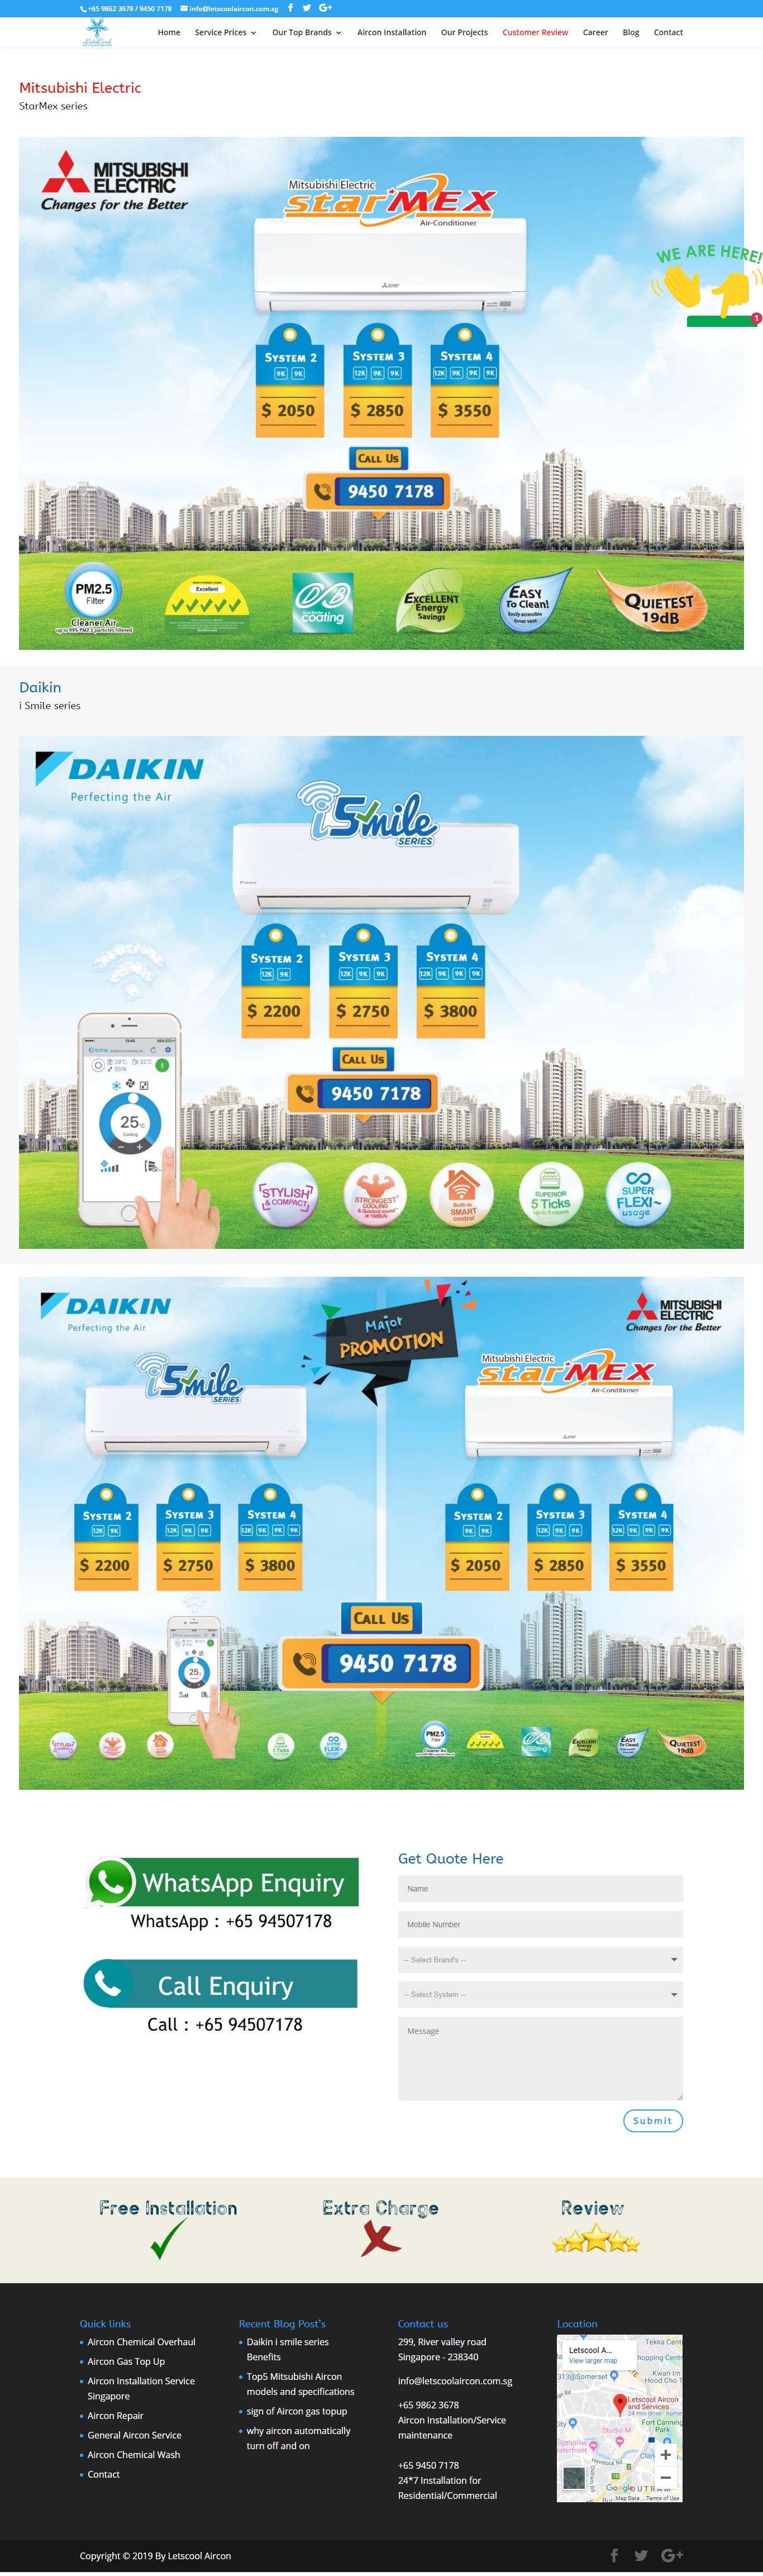 Aircon Service Aircon, Air conditioner service, Air con